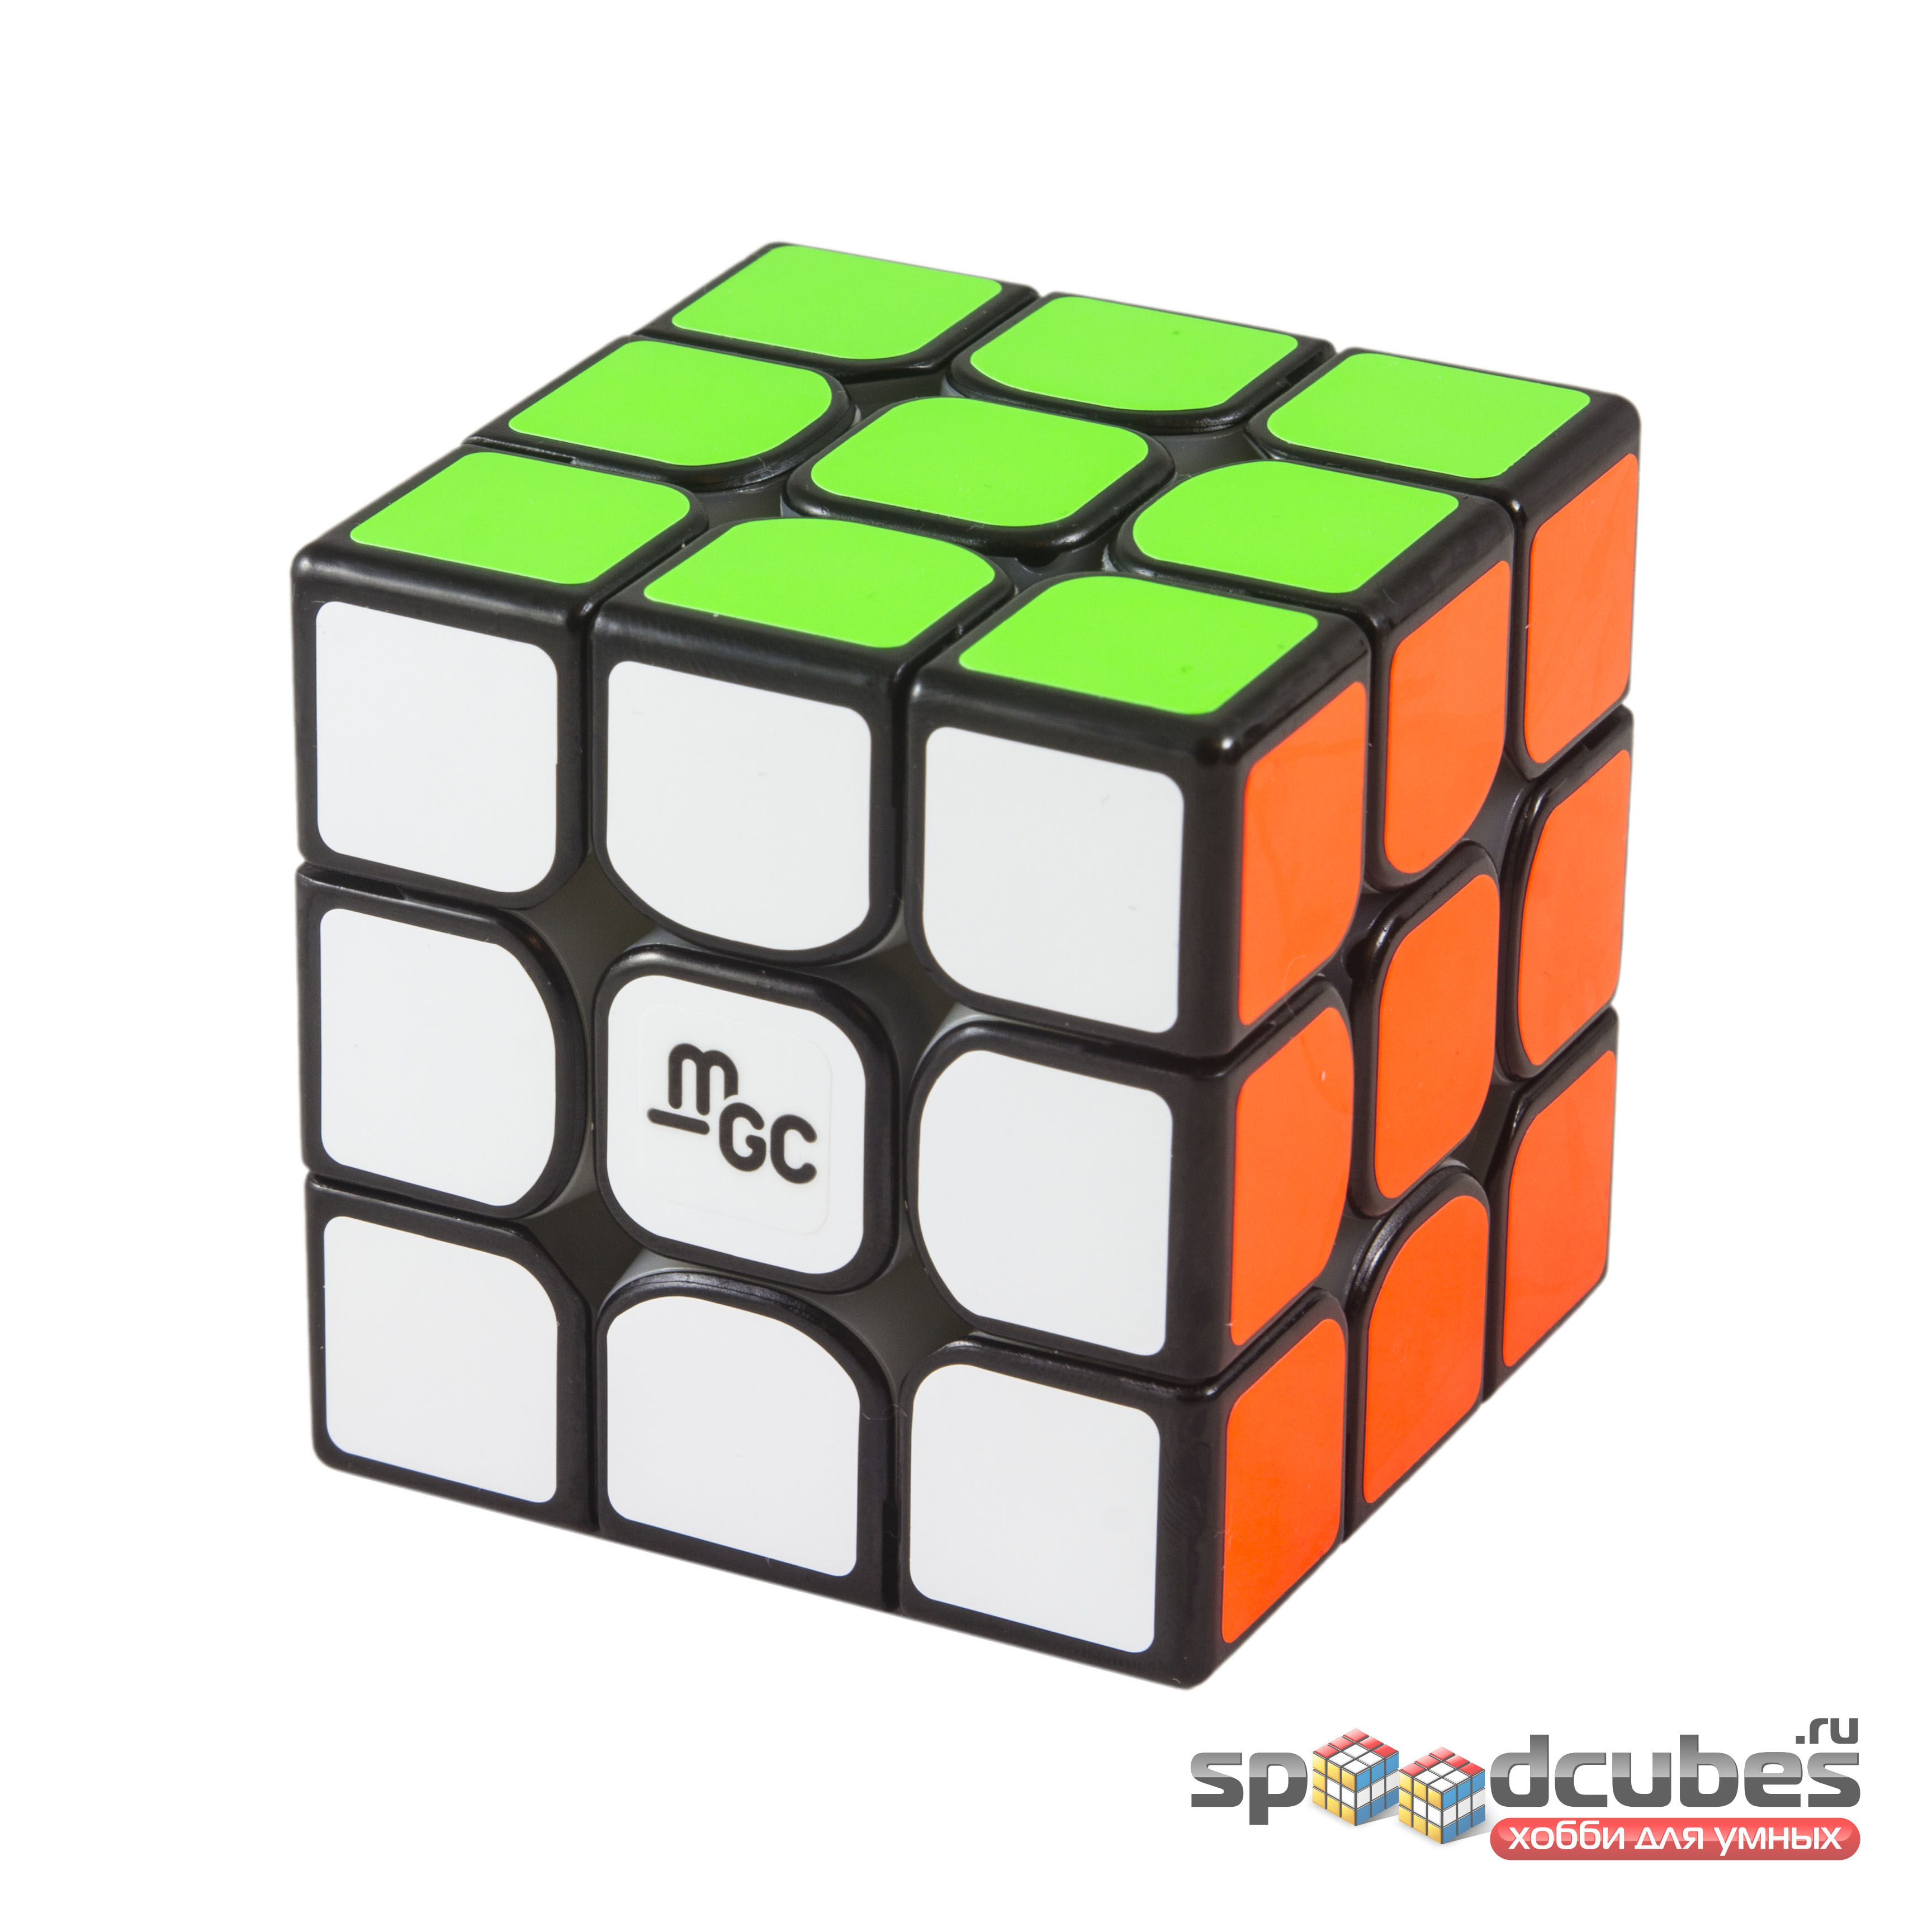 Yj Mgc 3x3x3 Magnetic 3